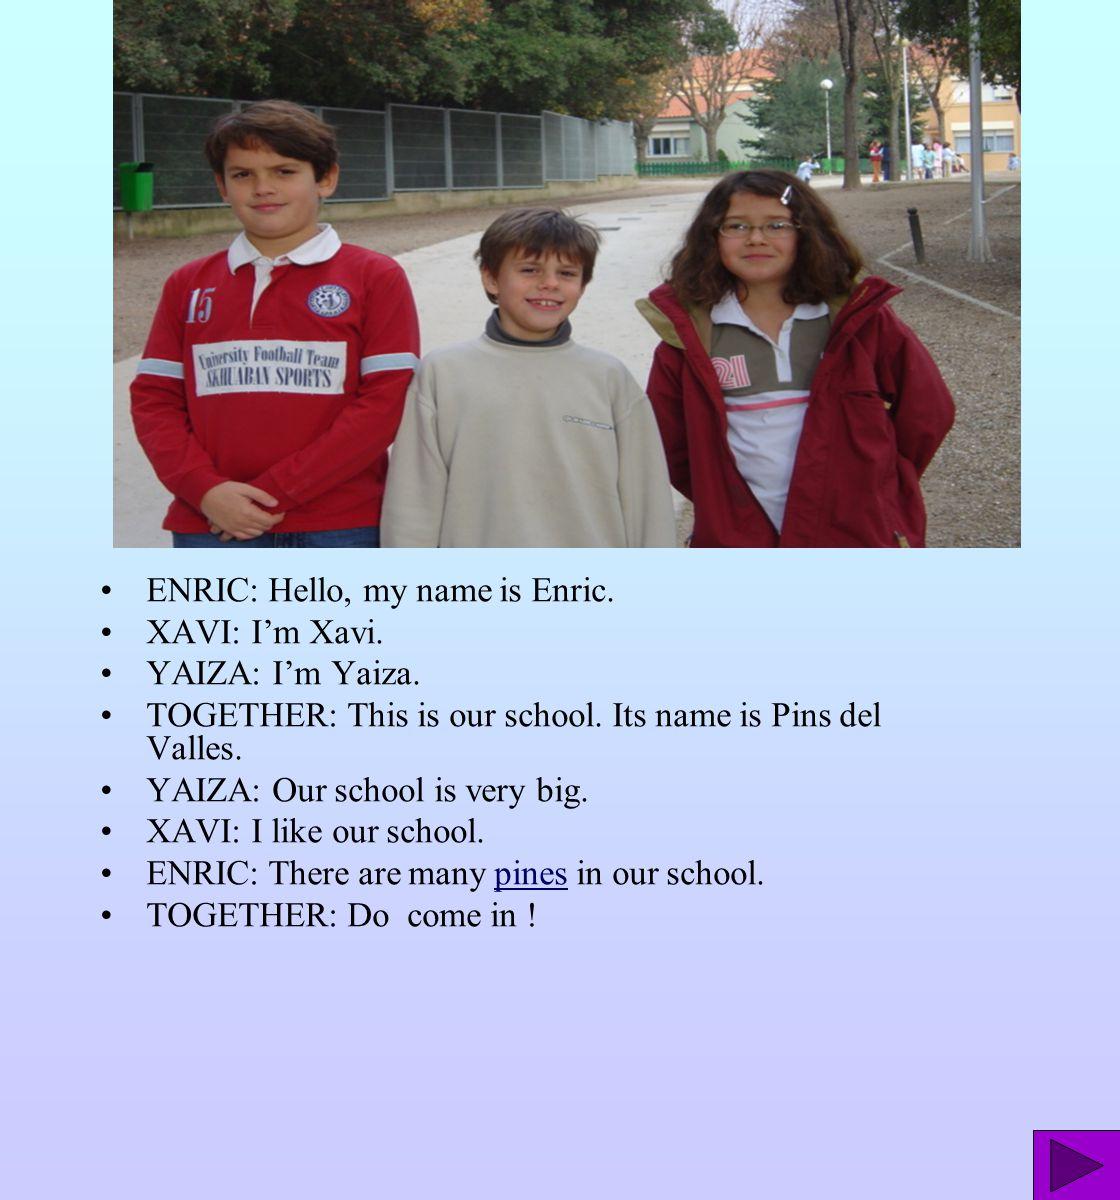 ENRIC: Hello, my name is Enric. XAVI: I'm Xavi. YAIZA: I'm Yaiza. TOGETHER: This is our school. Its name is Pins del Valles. YAIZA: Our school is very